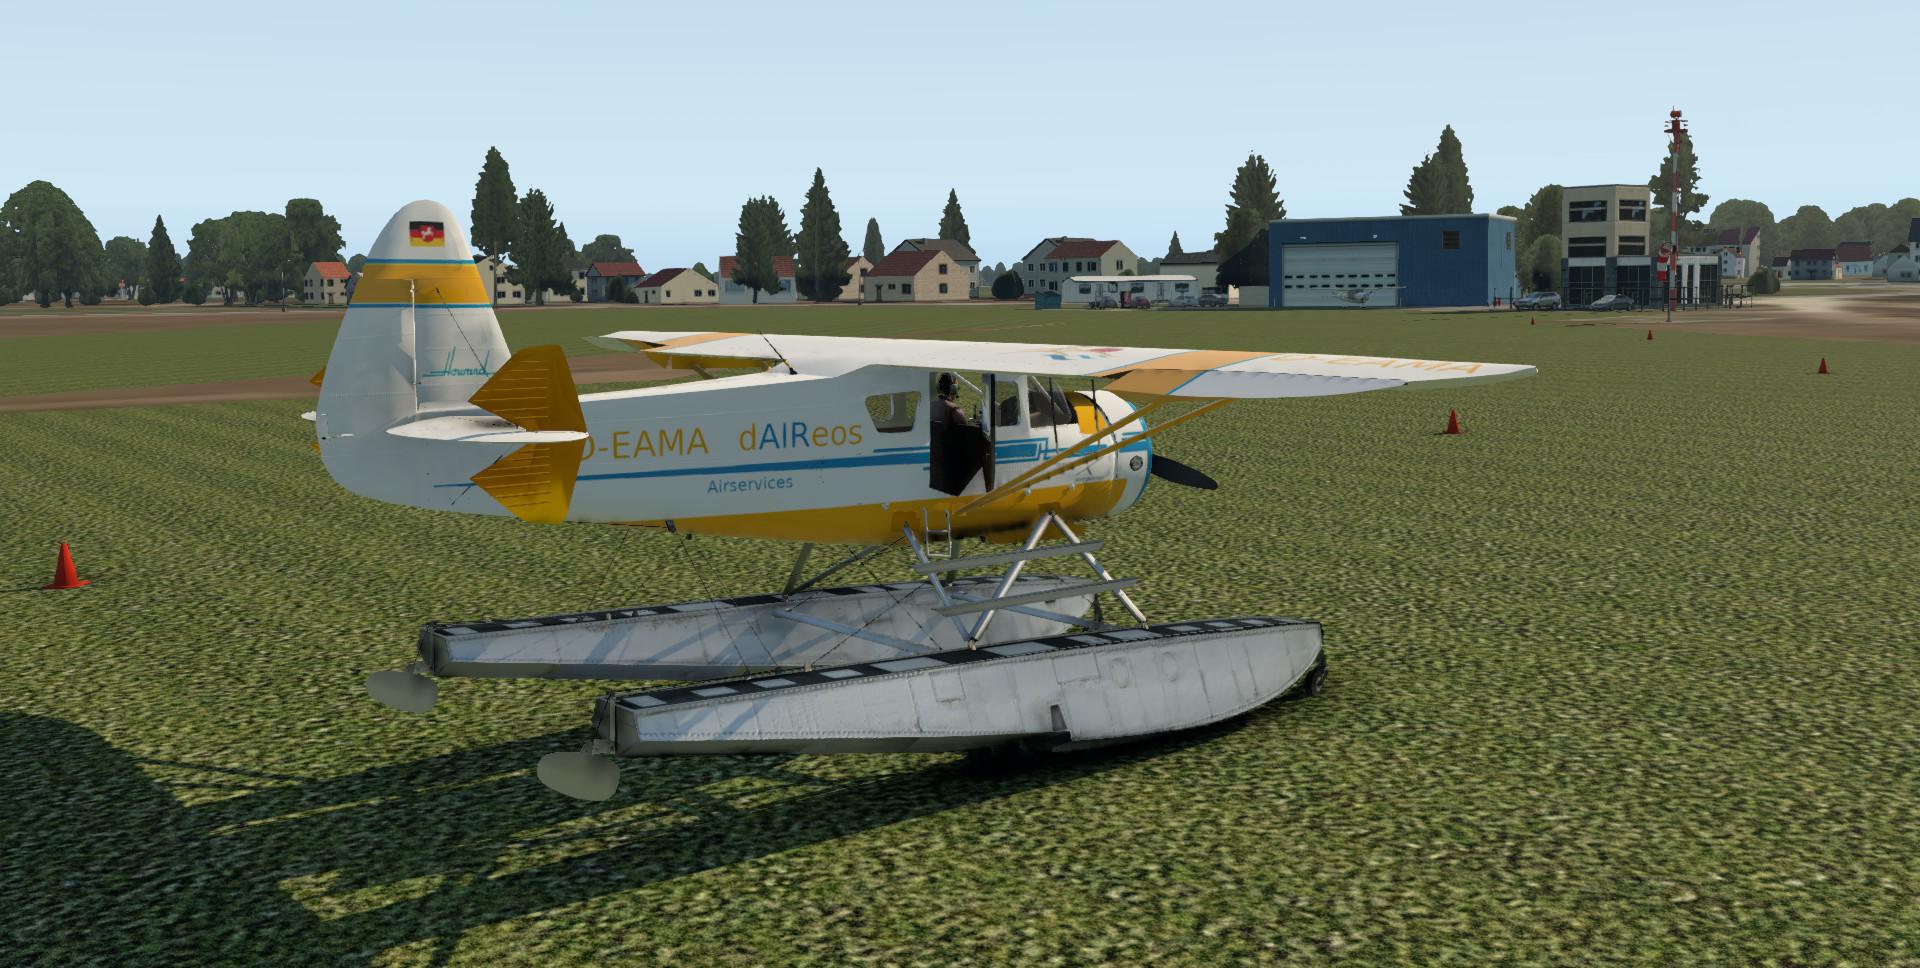 nordseerundflug-029boj3o.jpg